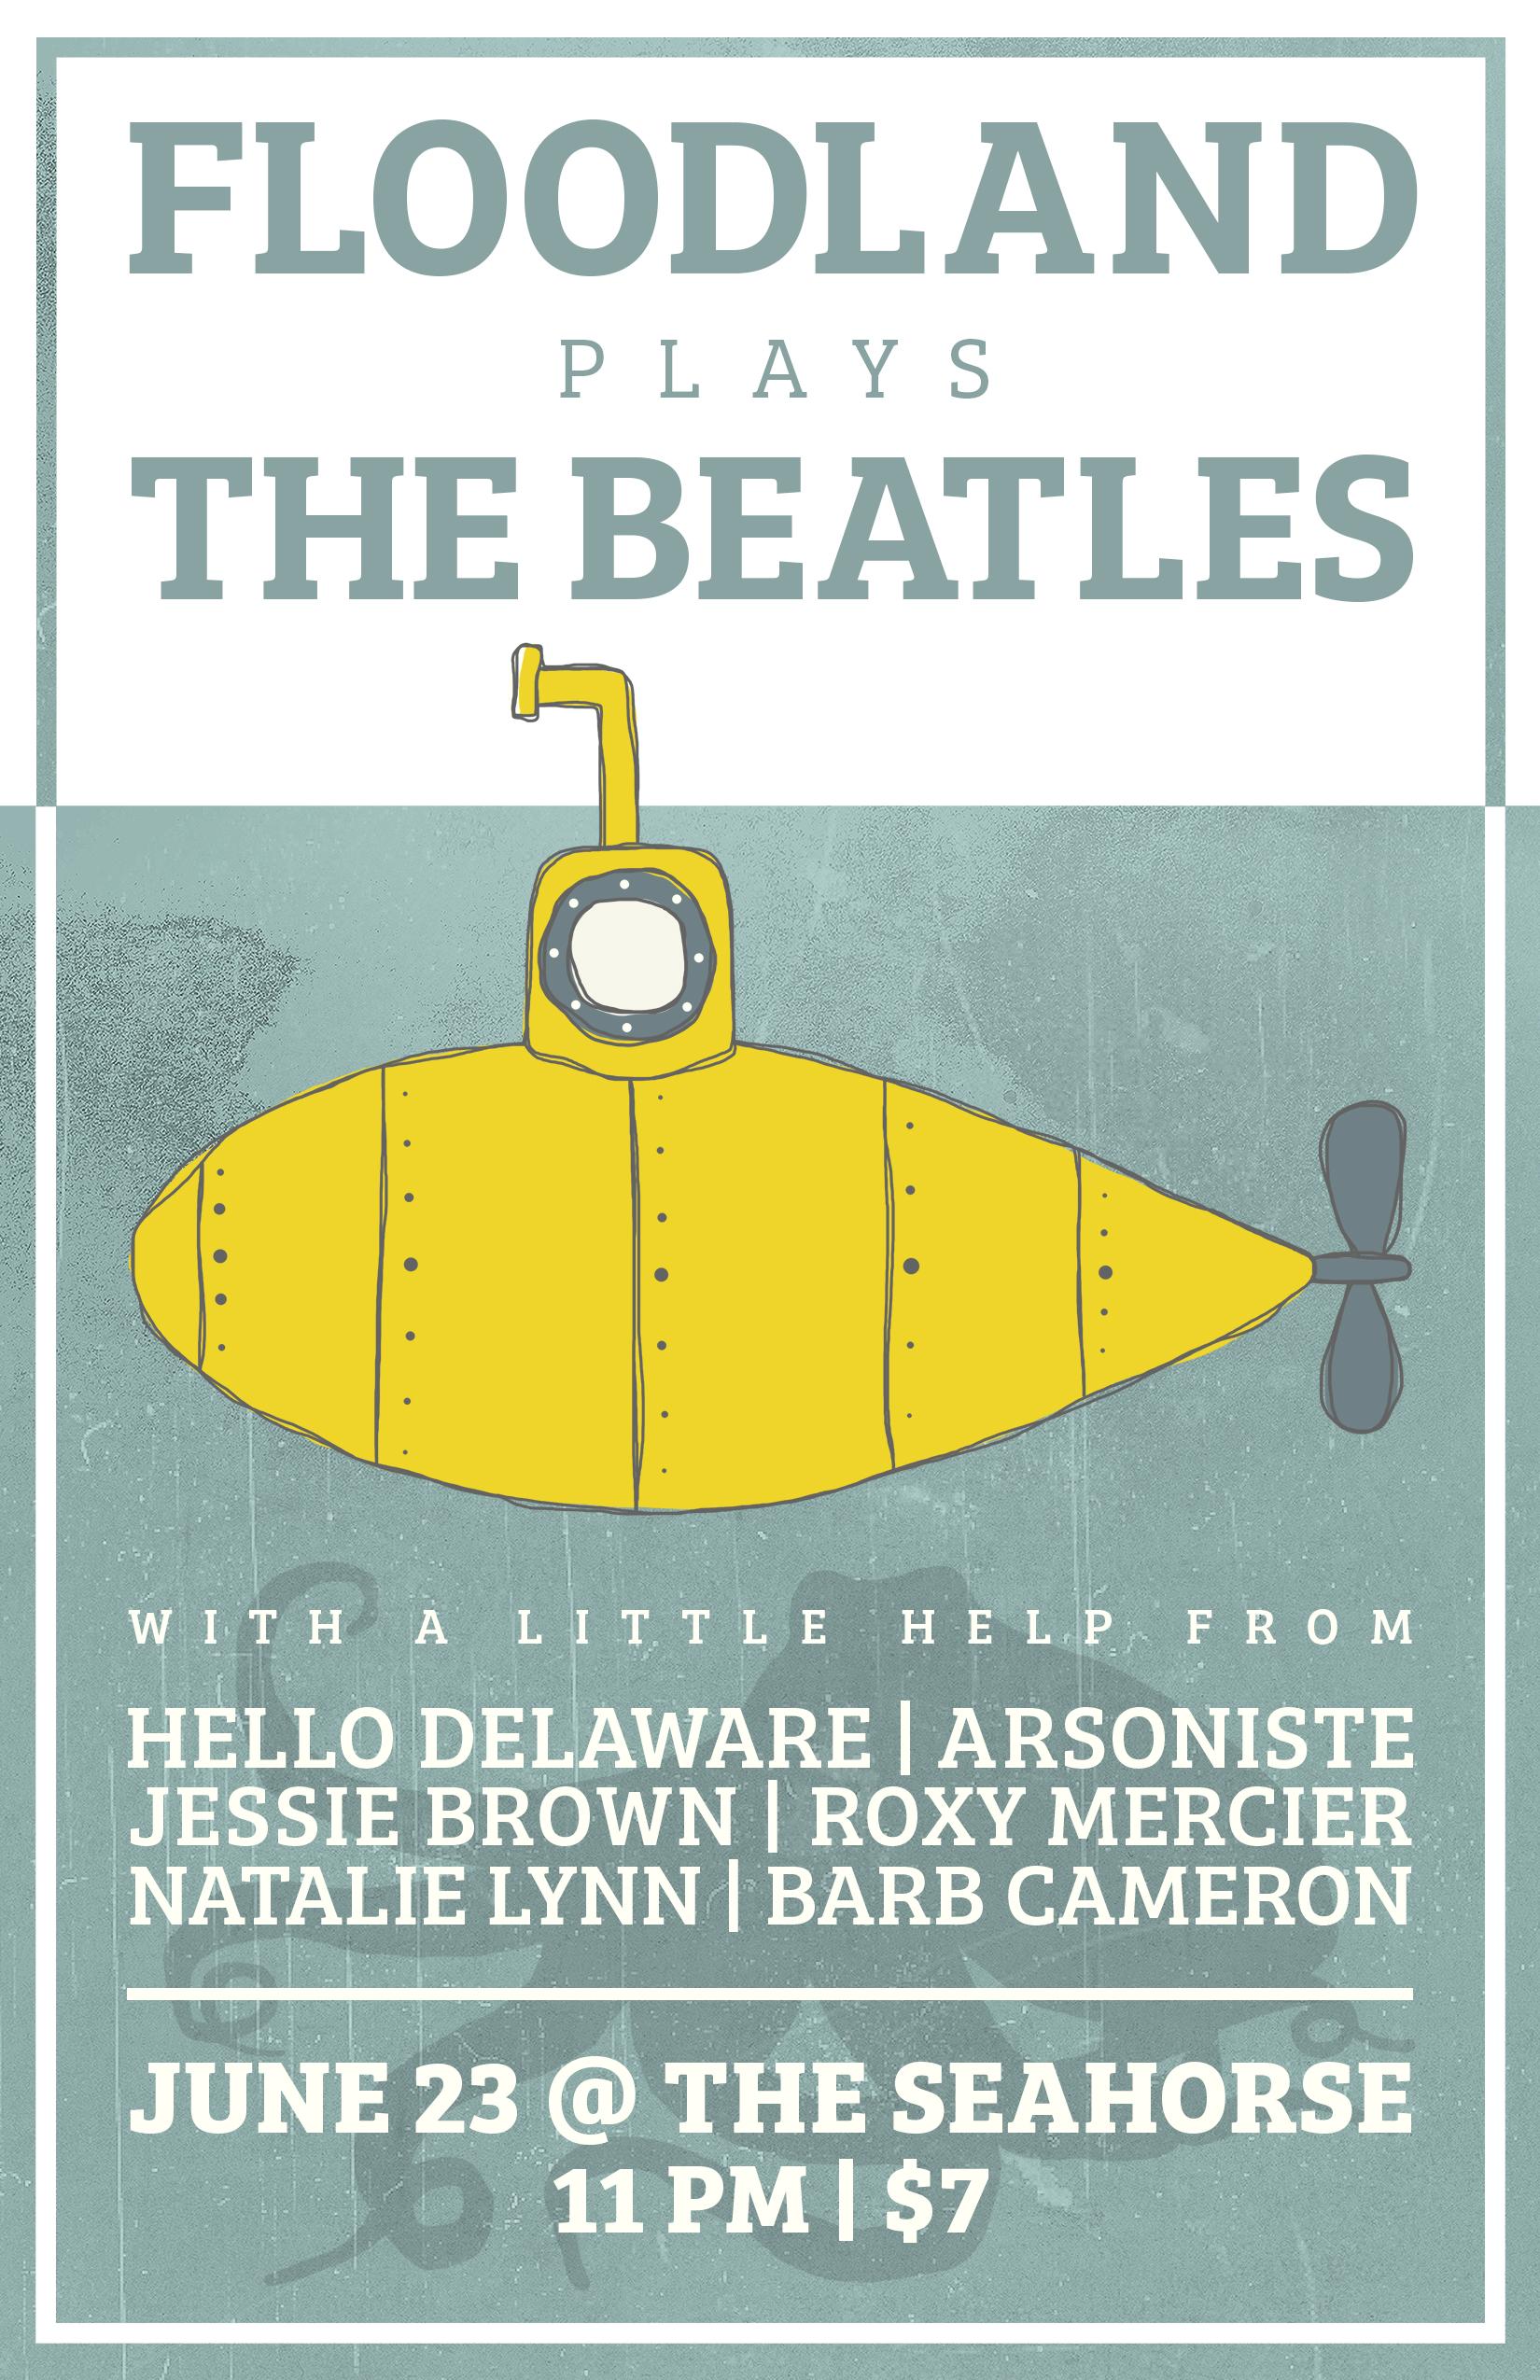 Floodland Beatles Poster WEB.jpg